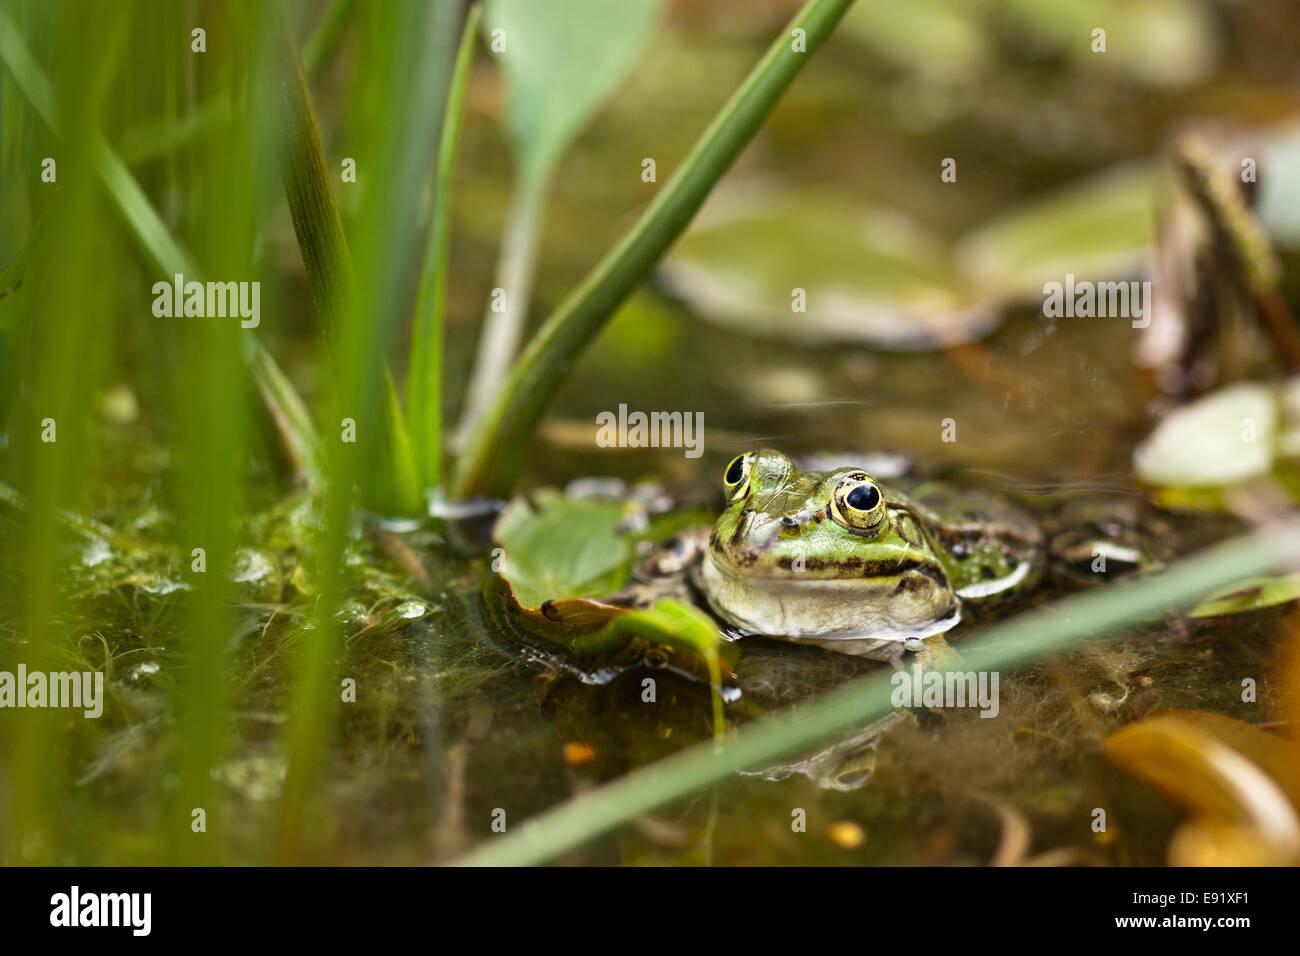 Edible Frog (Pelophylax kl. esculentus) - Stock Image